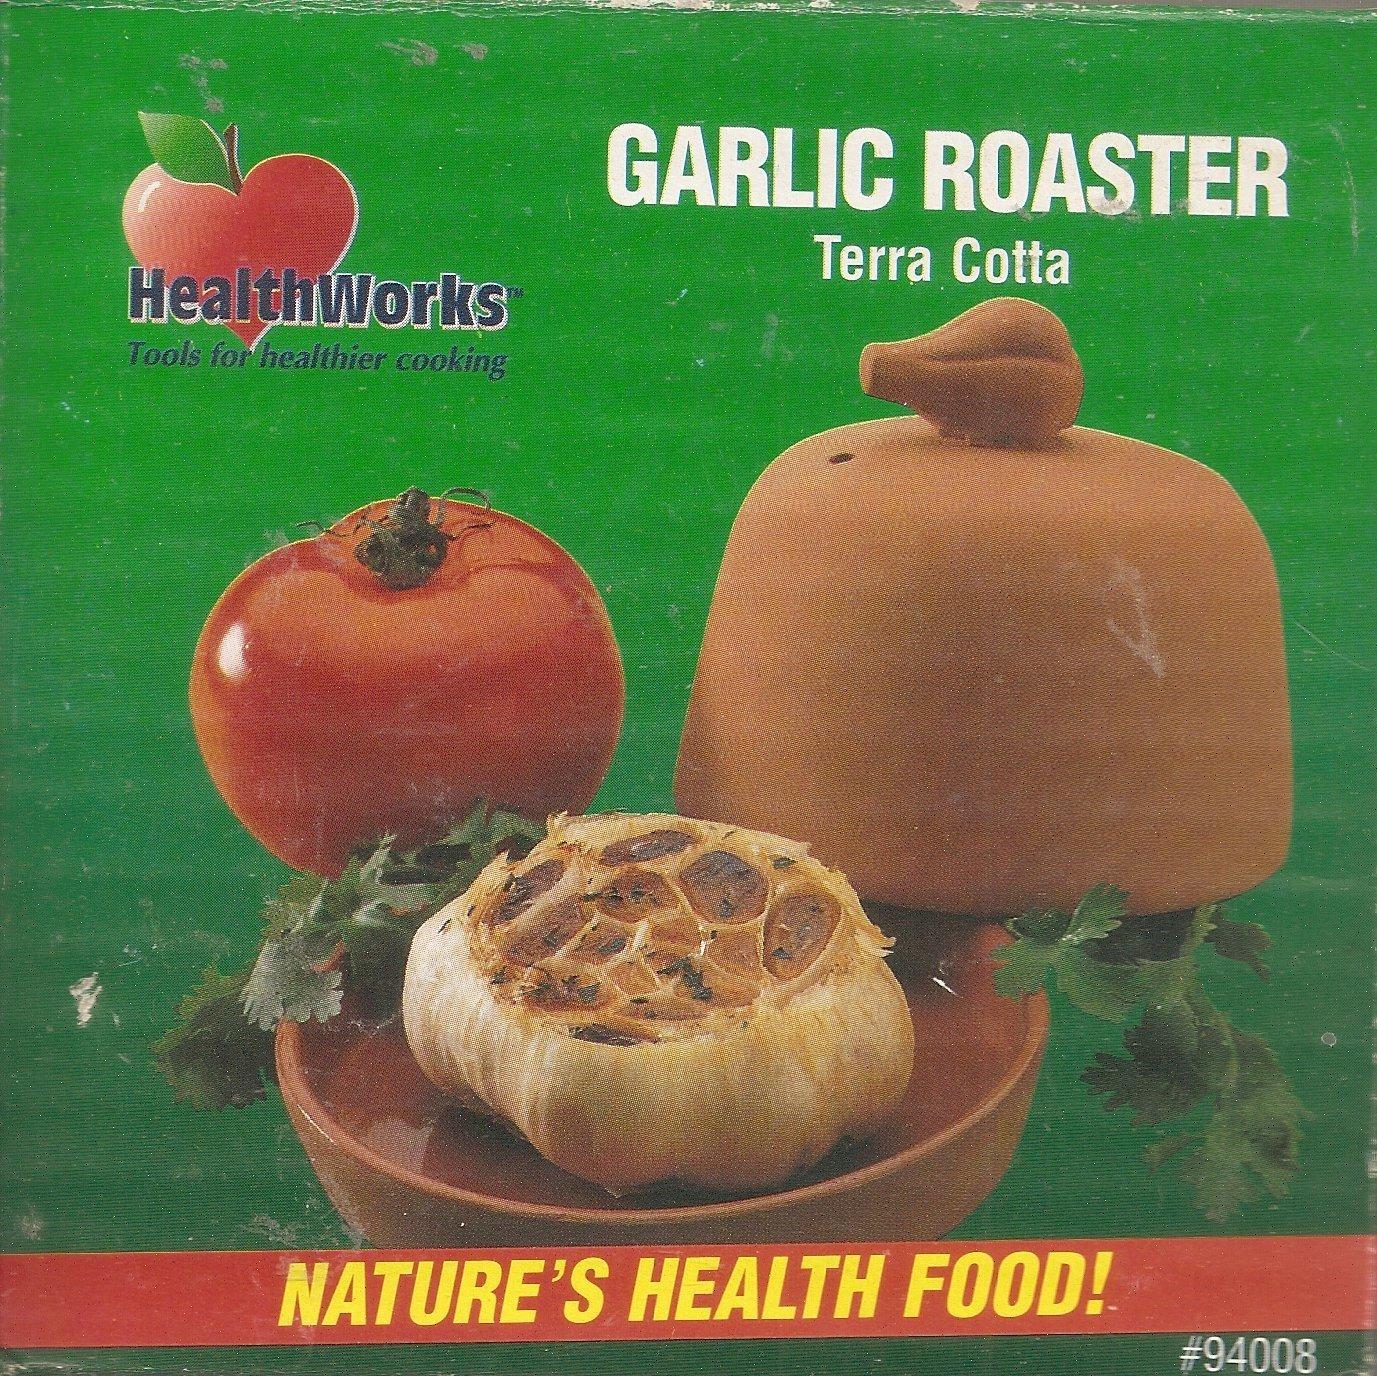 Garlic Roaster Terra Cotta